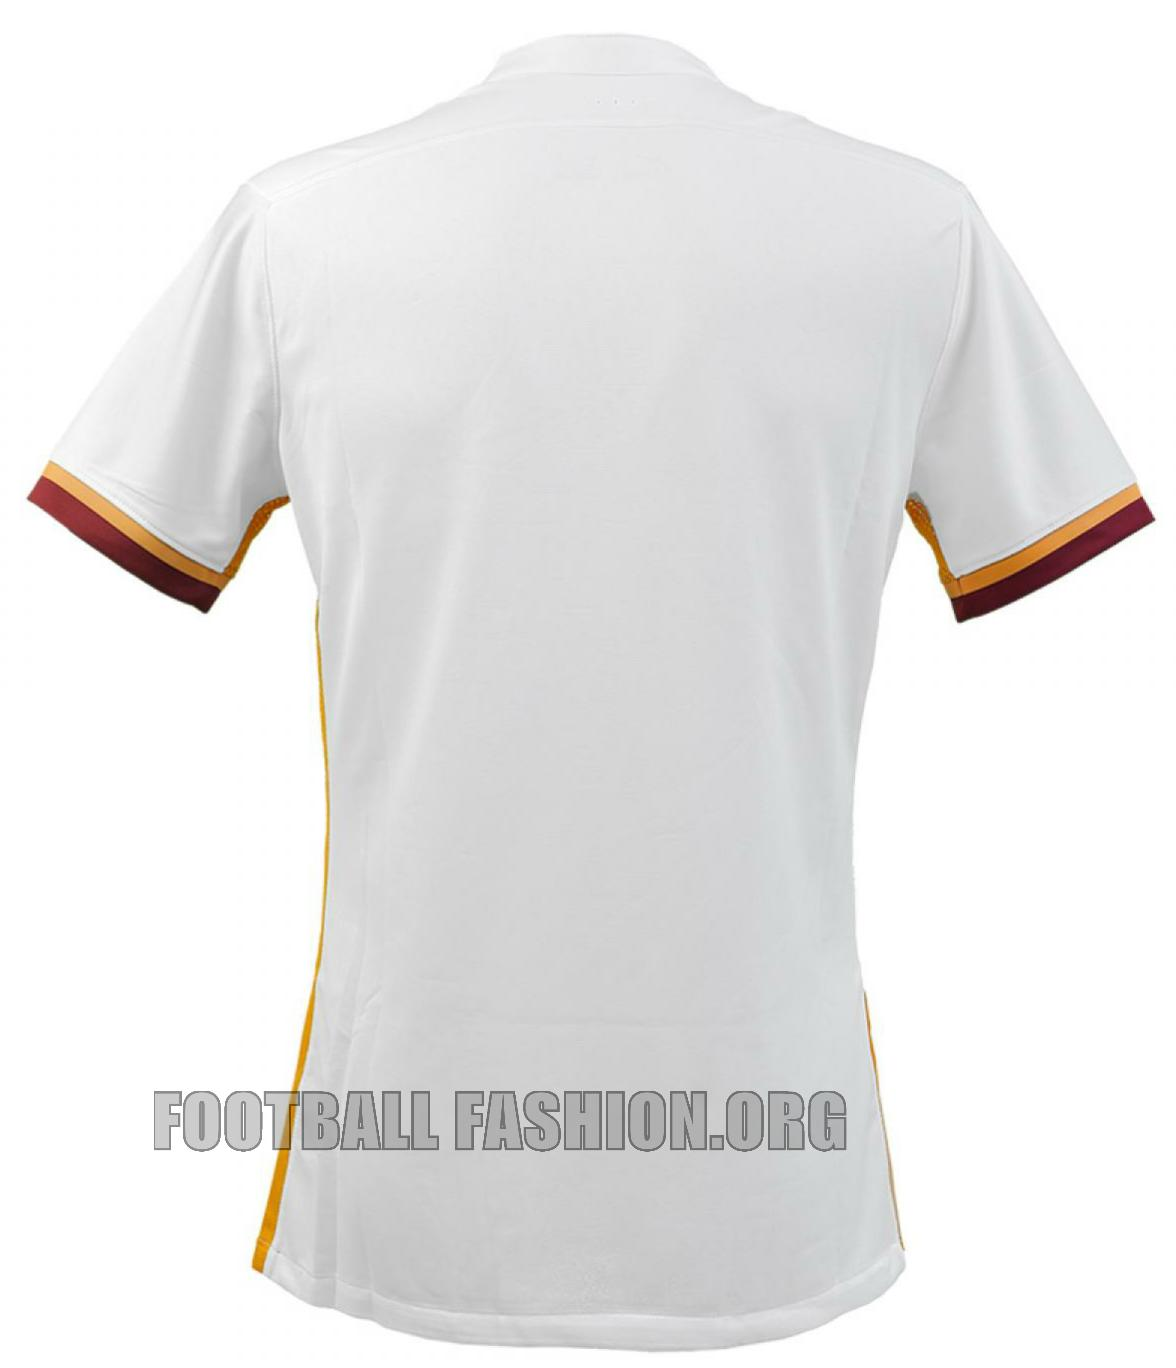 50c6d594381 AS Roma 2015 16 Nike Away Kit - FOOTBALL FASHION.ORG